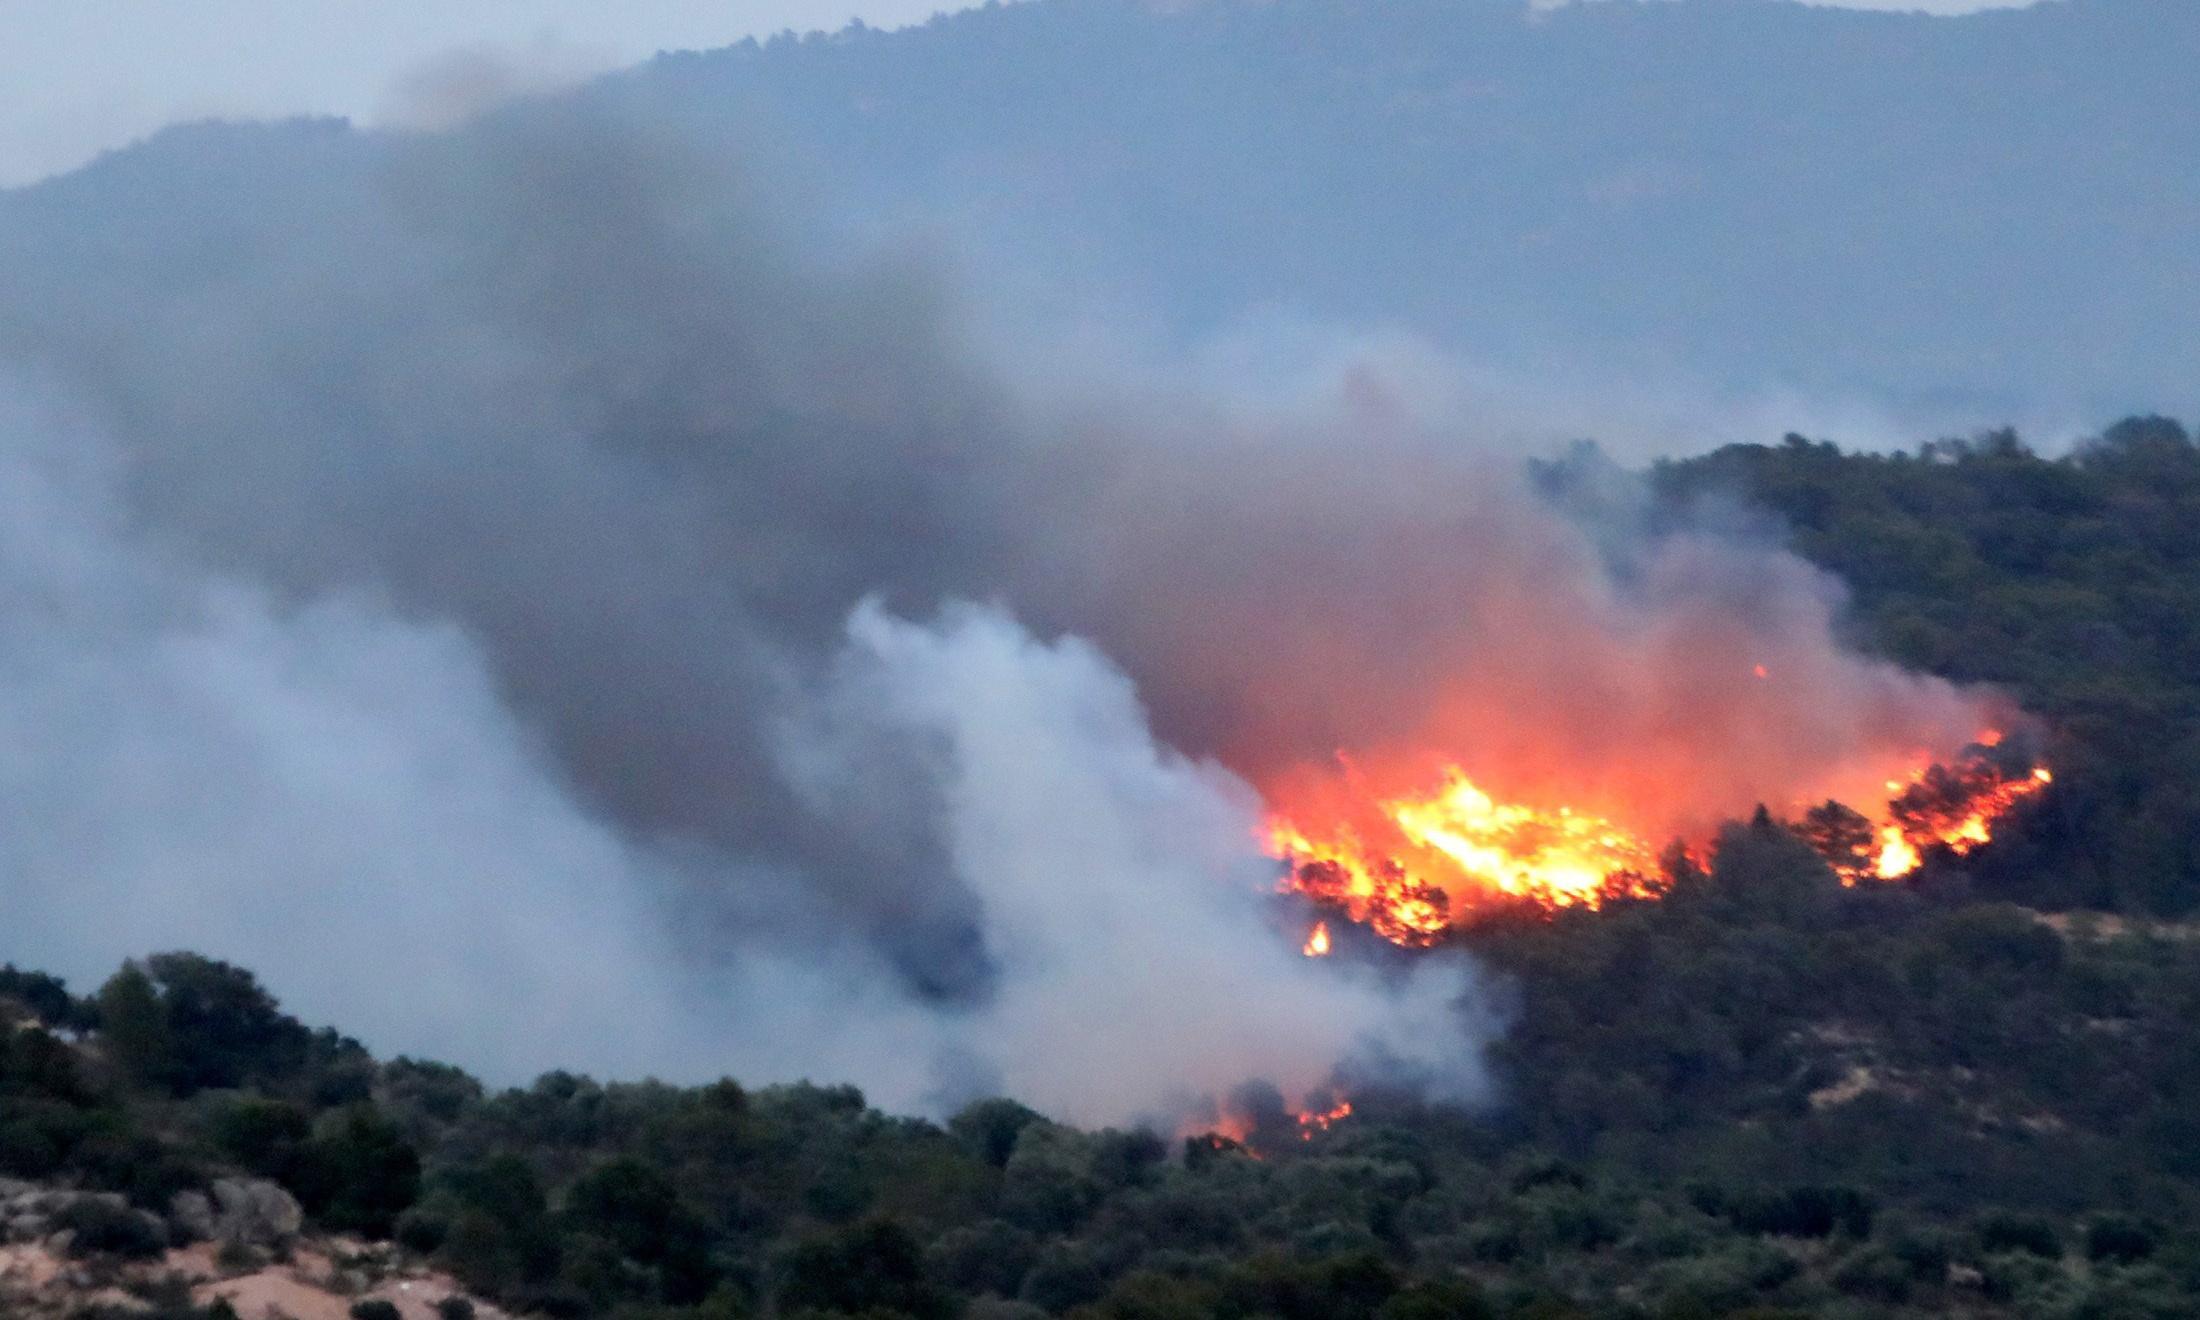 Spain fights huge forest fire as European heatwave intensifies